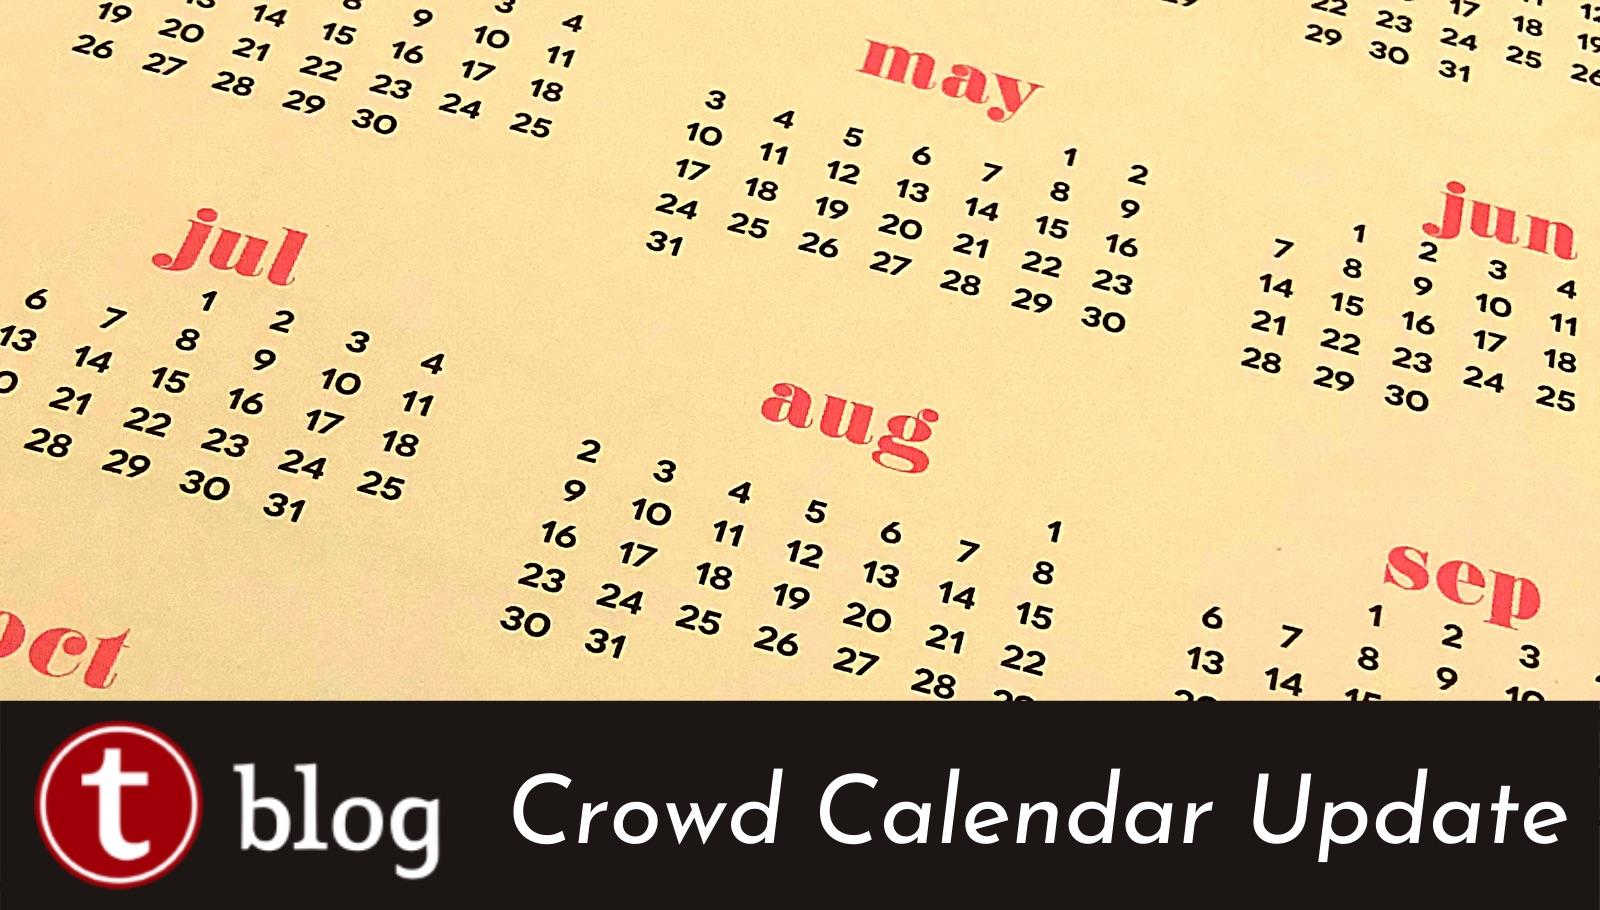 Universal Studios Crowd Calendar 2022.Universal Orlando Crowd Calendar Update March 2021 Touringplans Com Blog